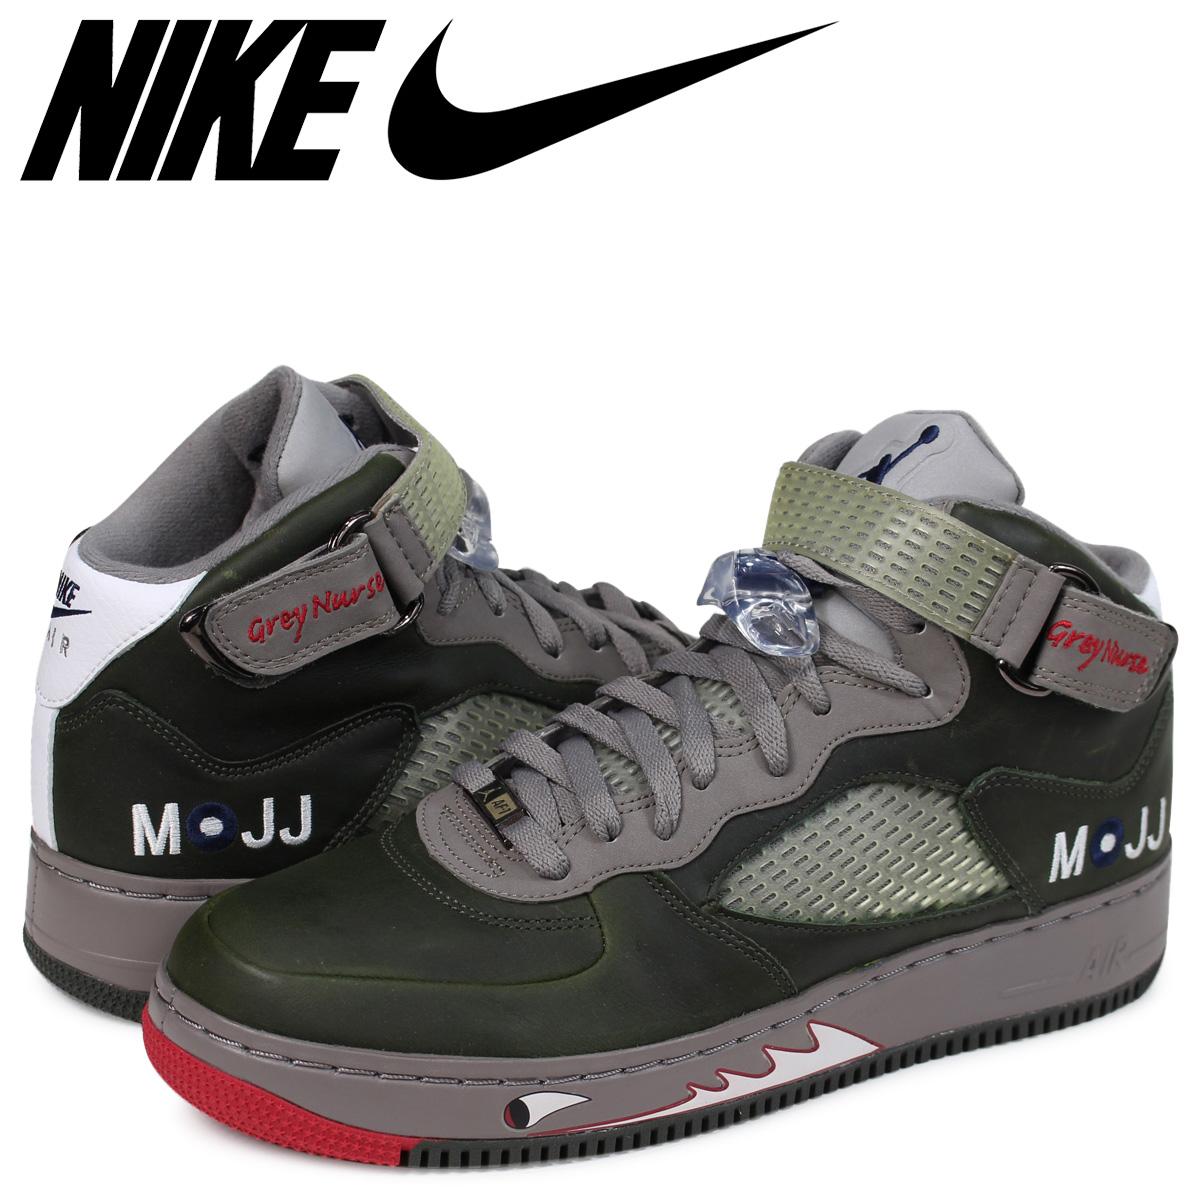 9fc12446a1dc63 ALLSPORTS  NIKE AIR JORDAN FUSION 5 PREMIER Nike Air Jordan sneakers ...